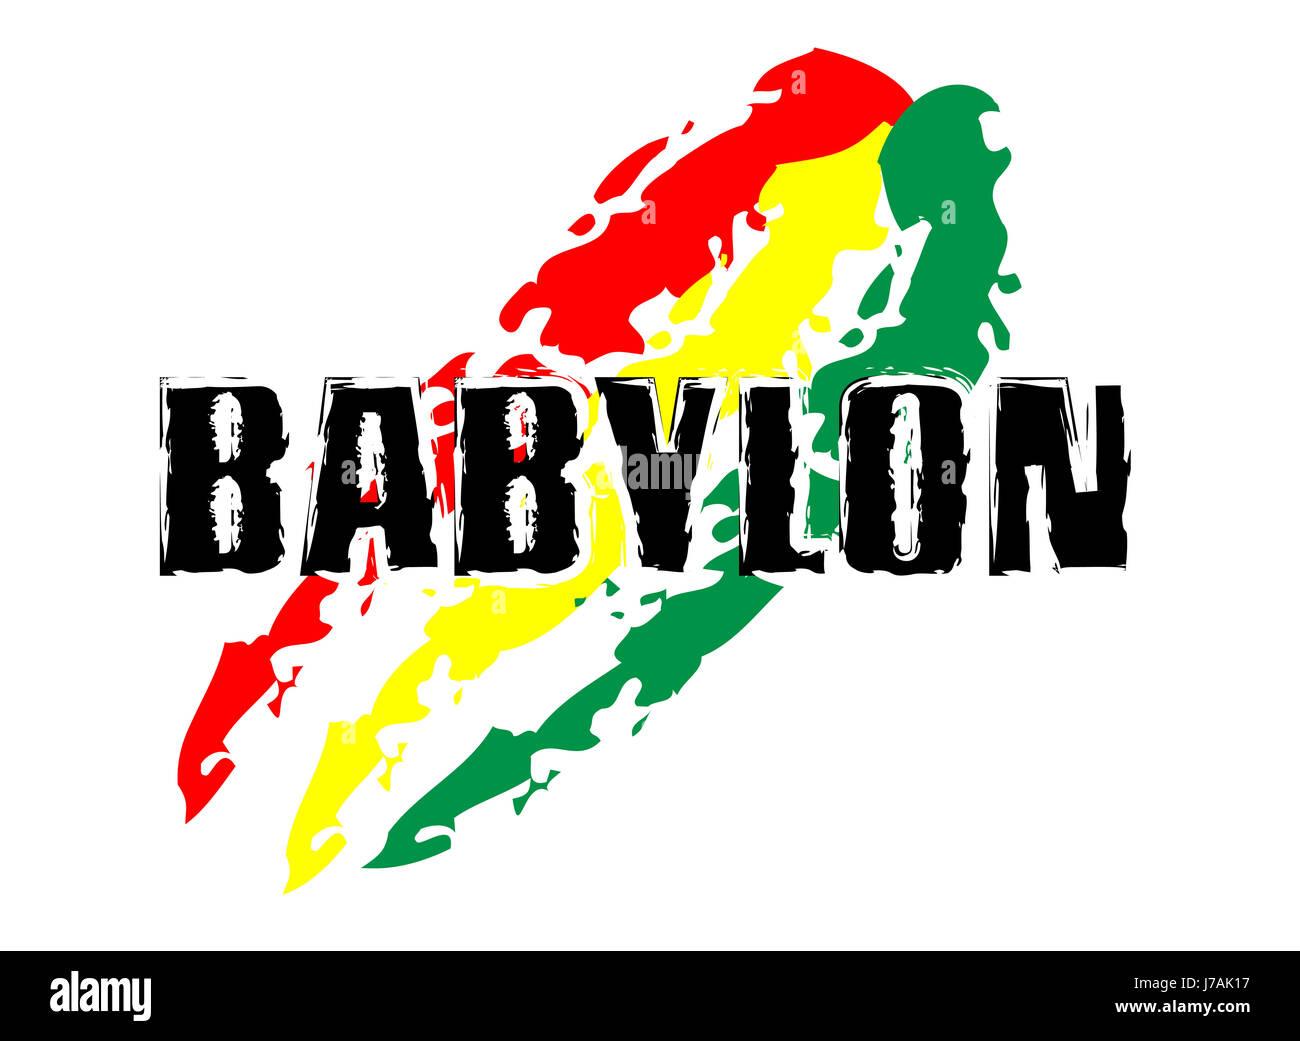 Rastafari sign stock photos rastafari sign stock images alamy rastafari concept babylon flag stock image biocorpaavc Image collections